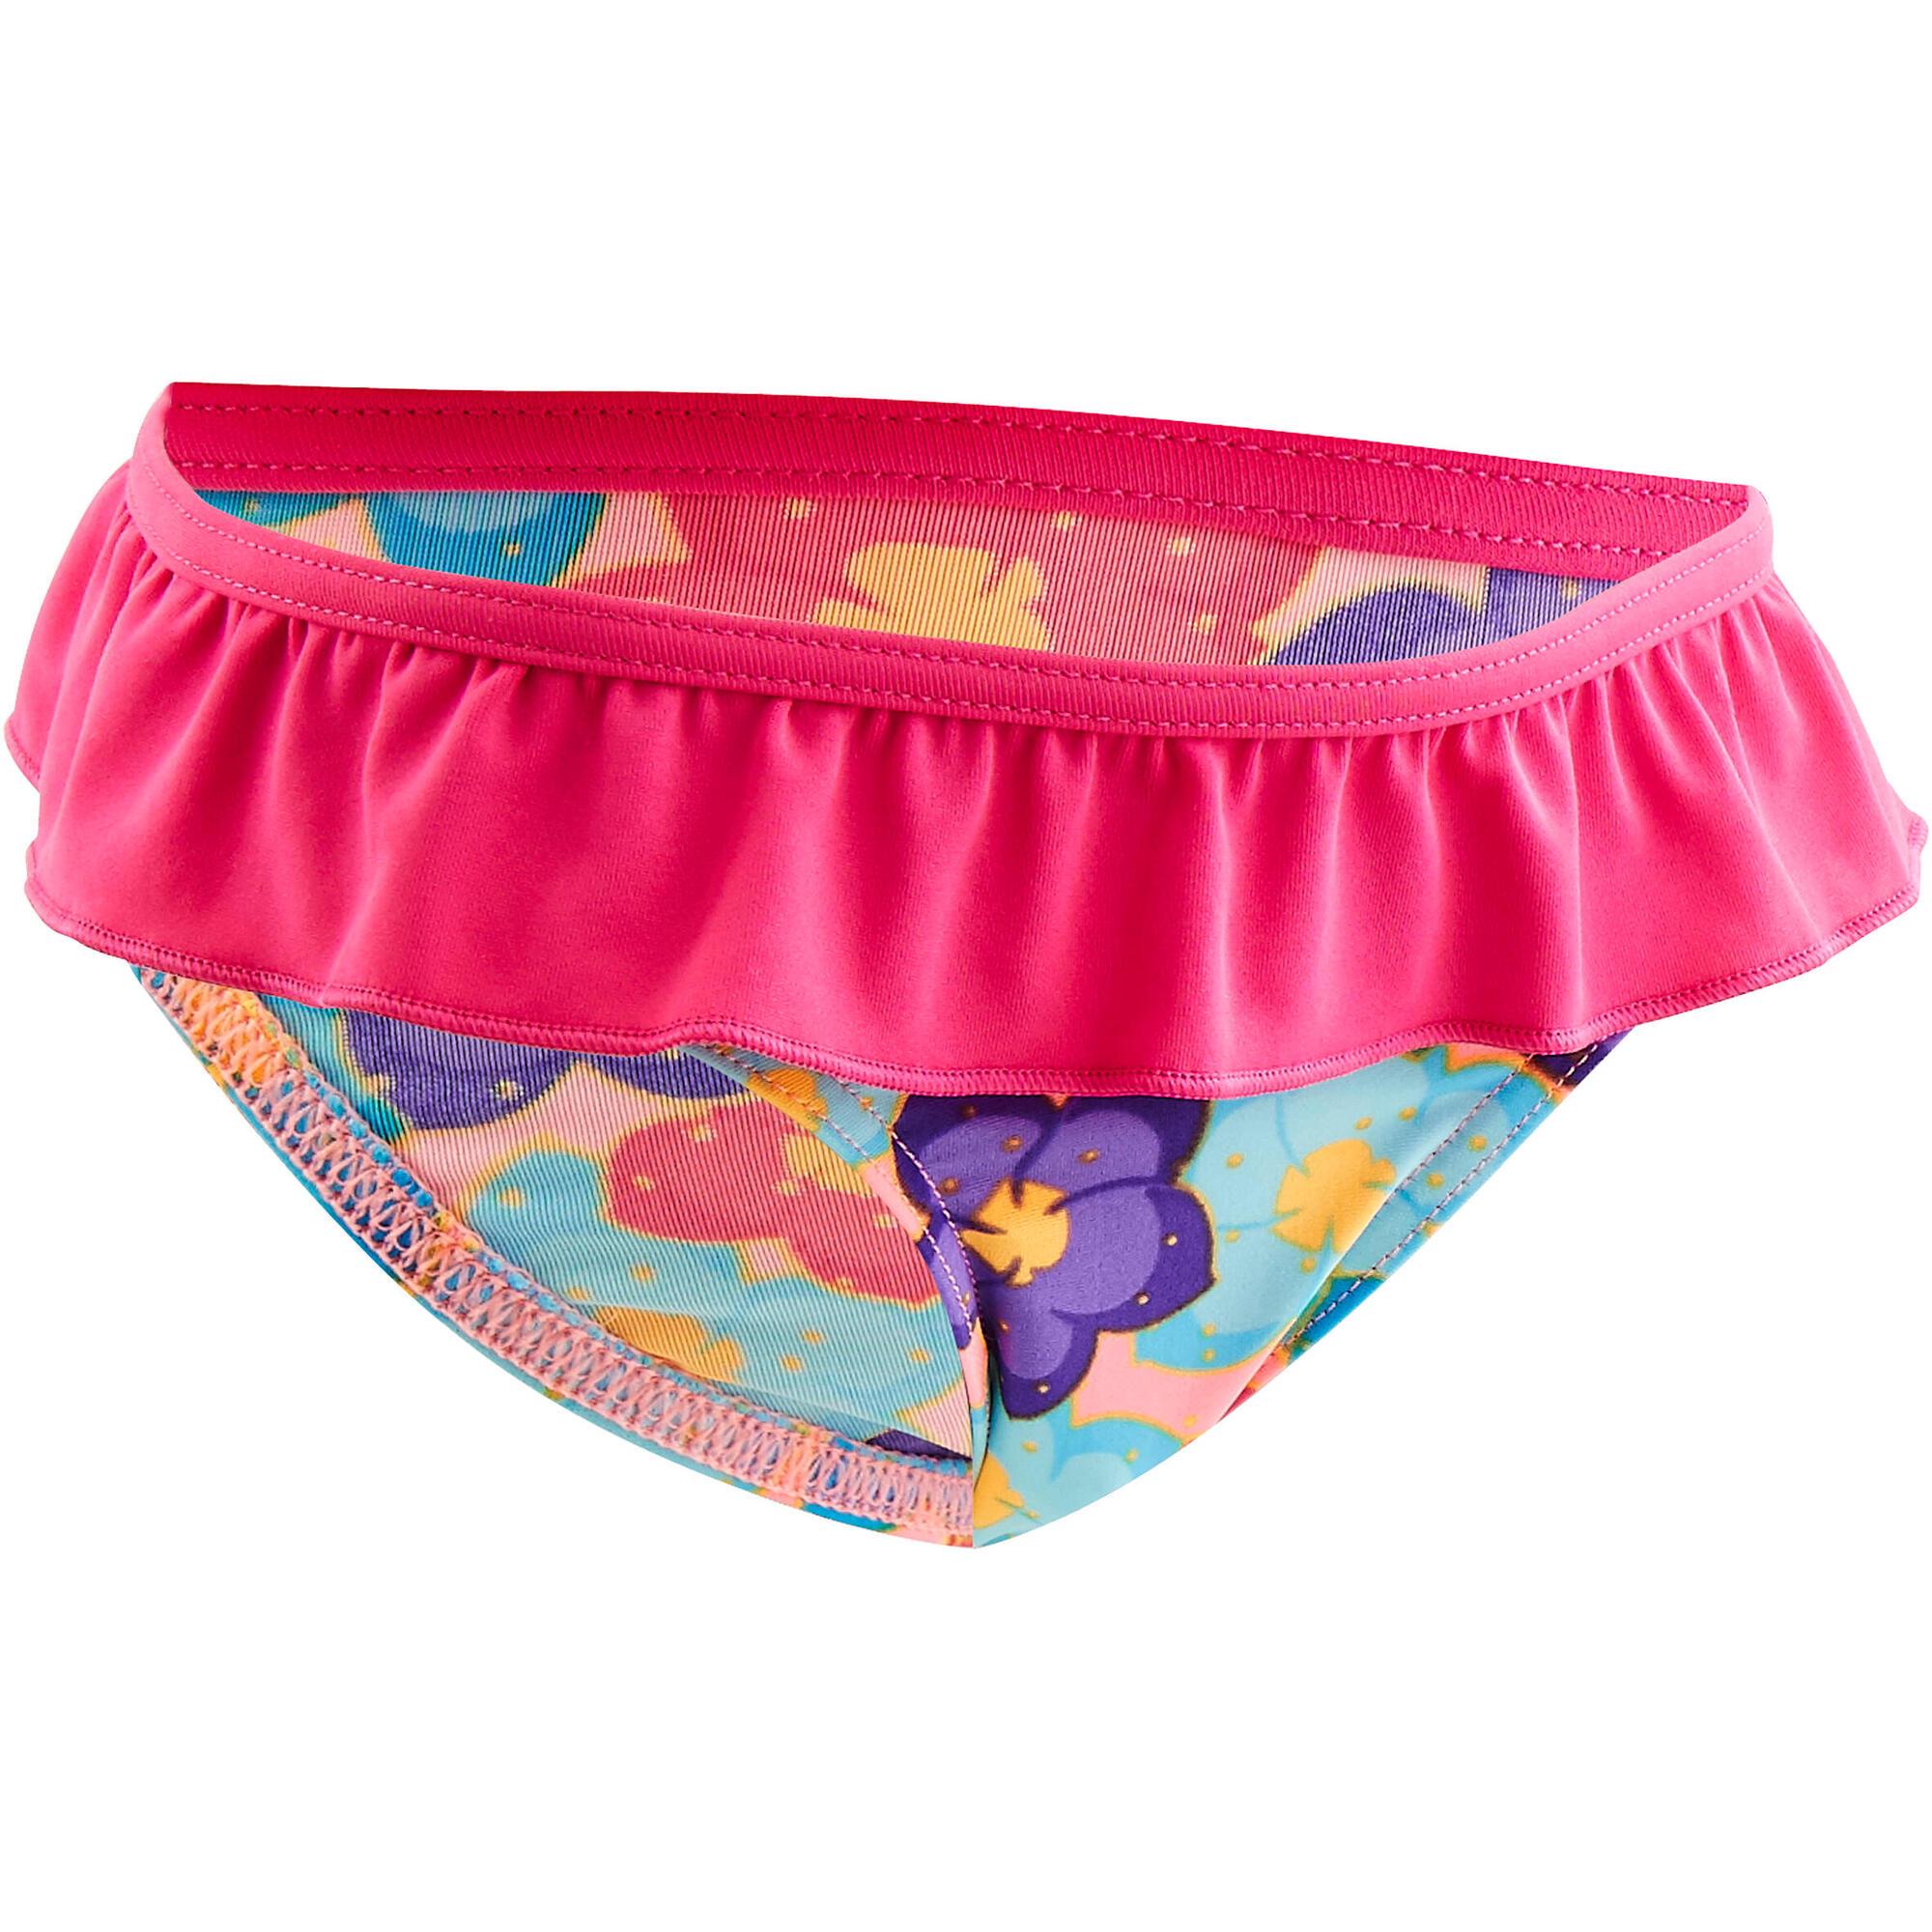 15cbe61fc3 Maillot de bain une pièce culotte bébé imprimé rose | Nabaiji